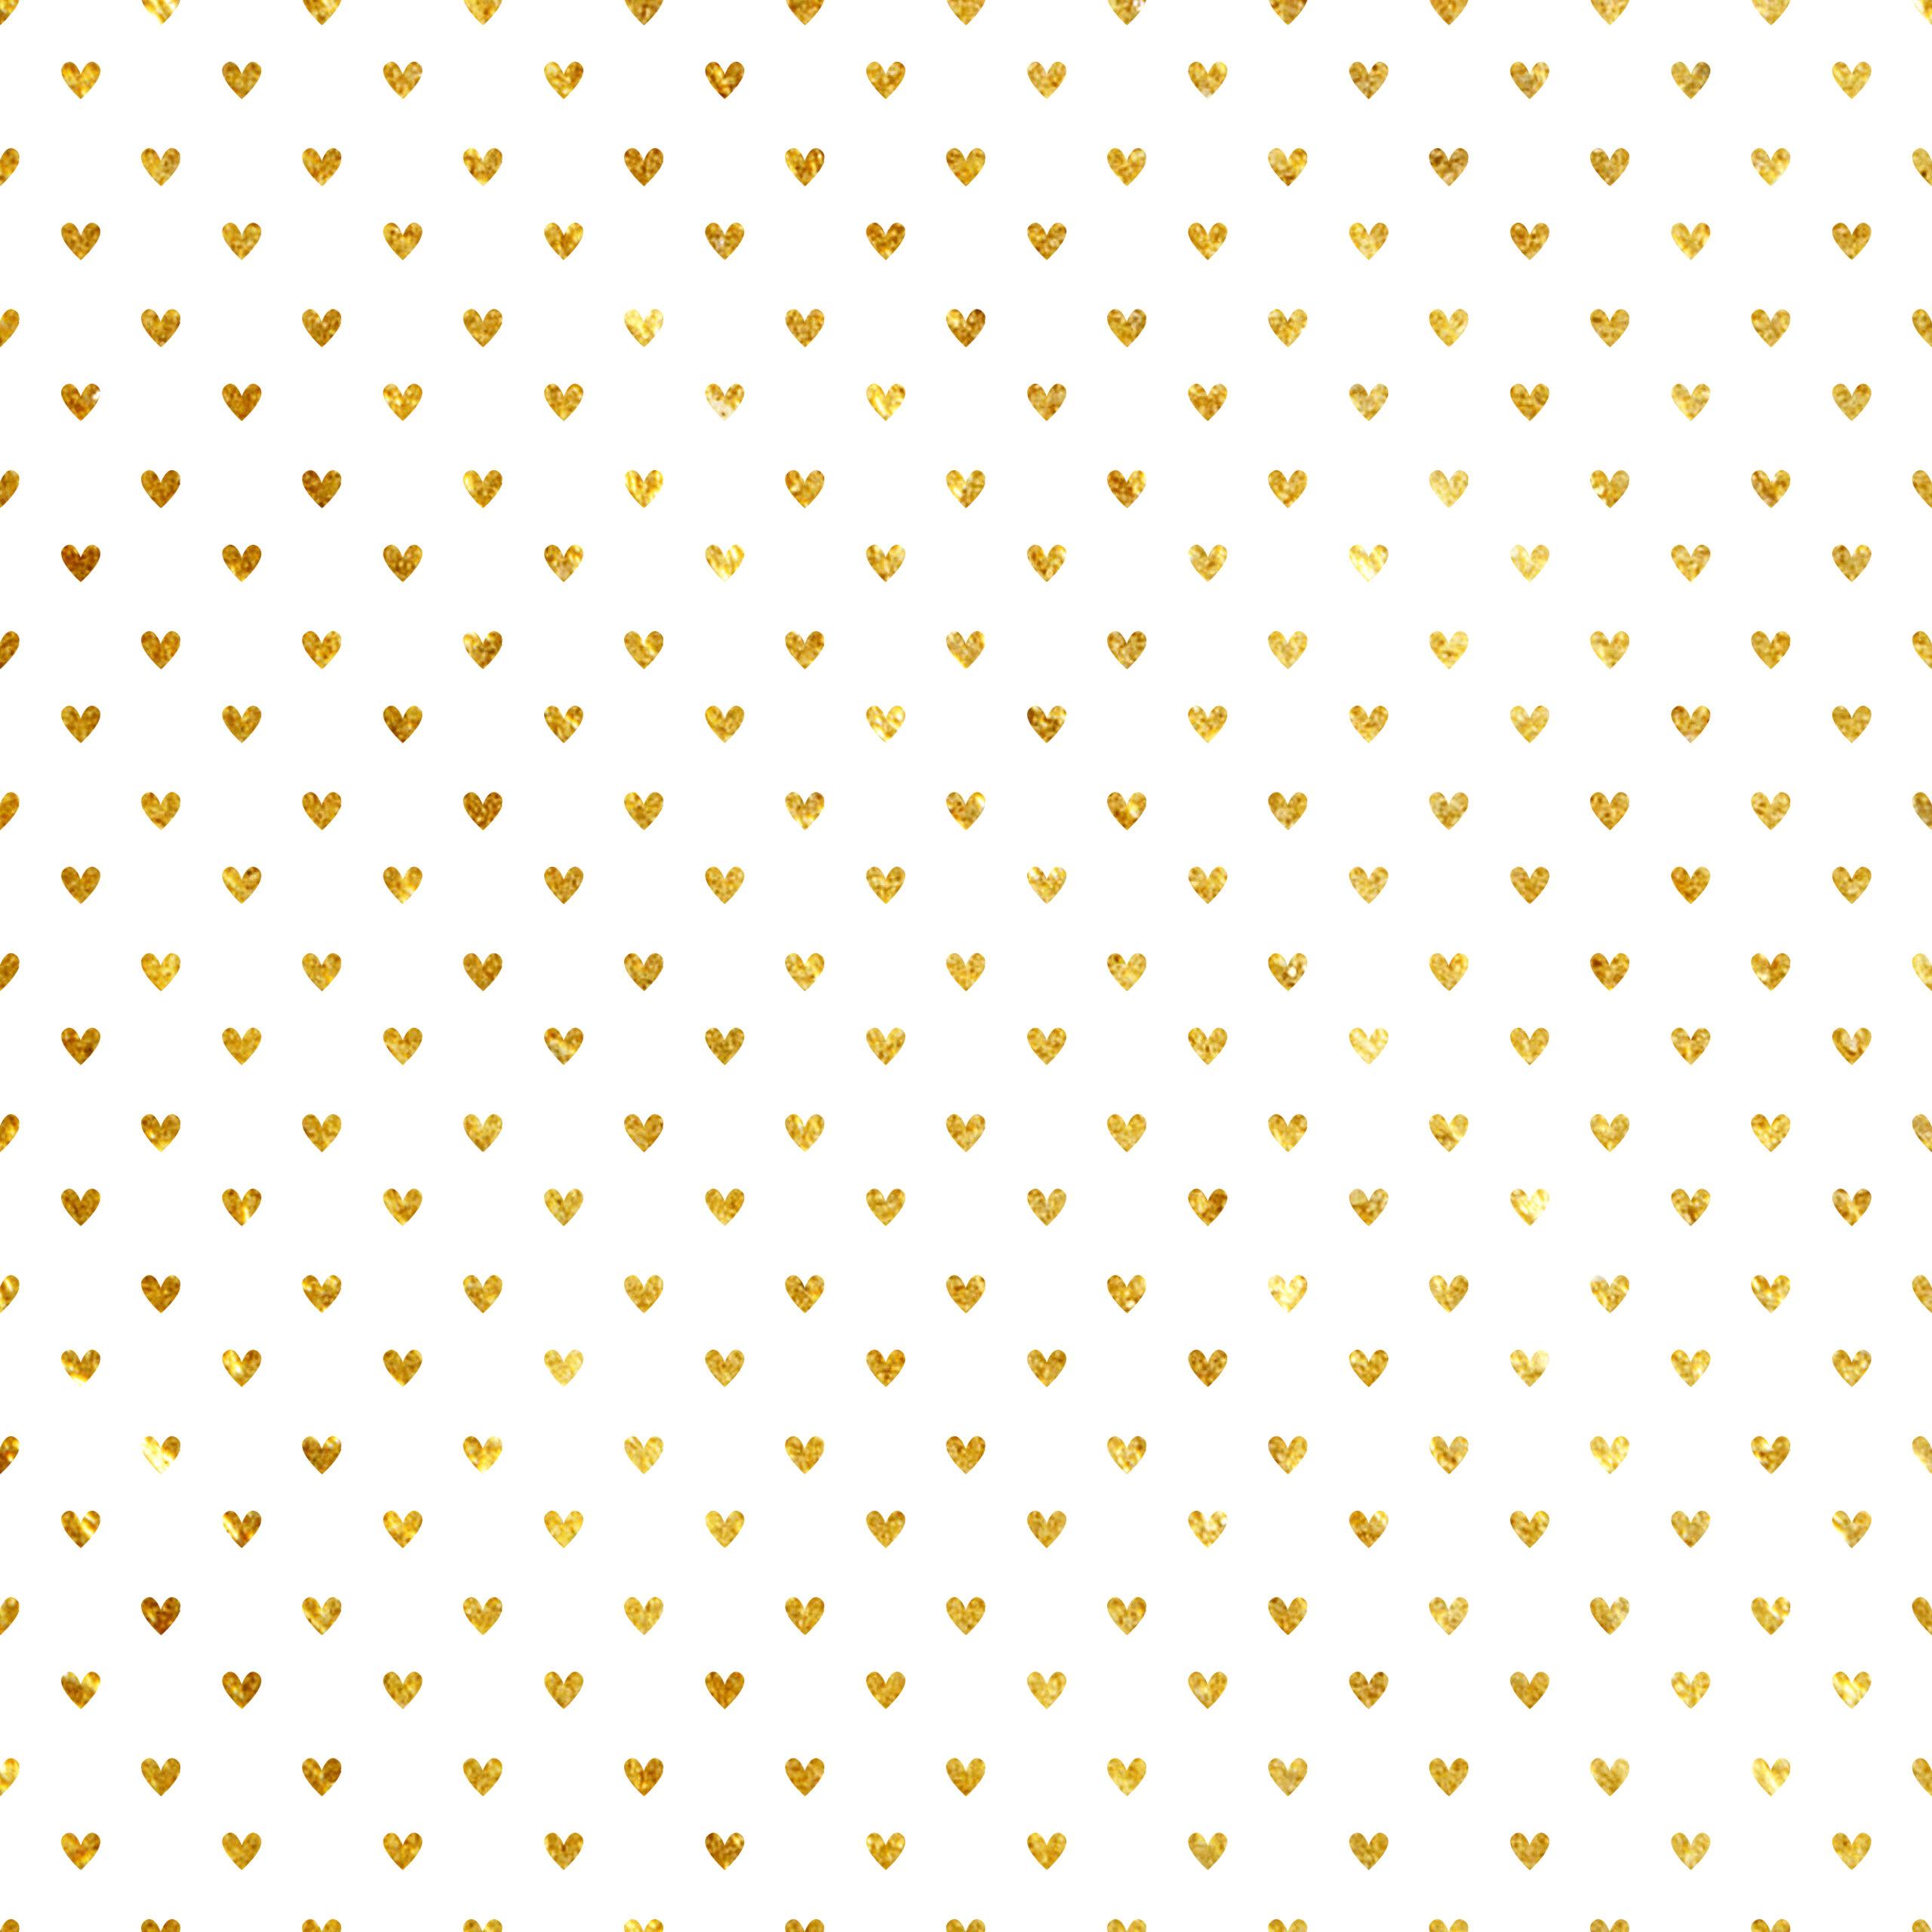 Scrapbook paper - Free Digital Scrapbook Paper Coral Gold And White